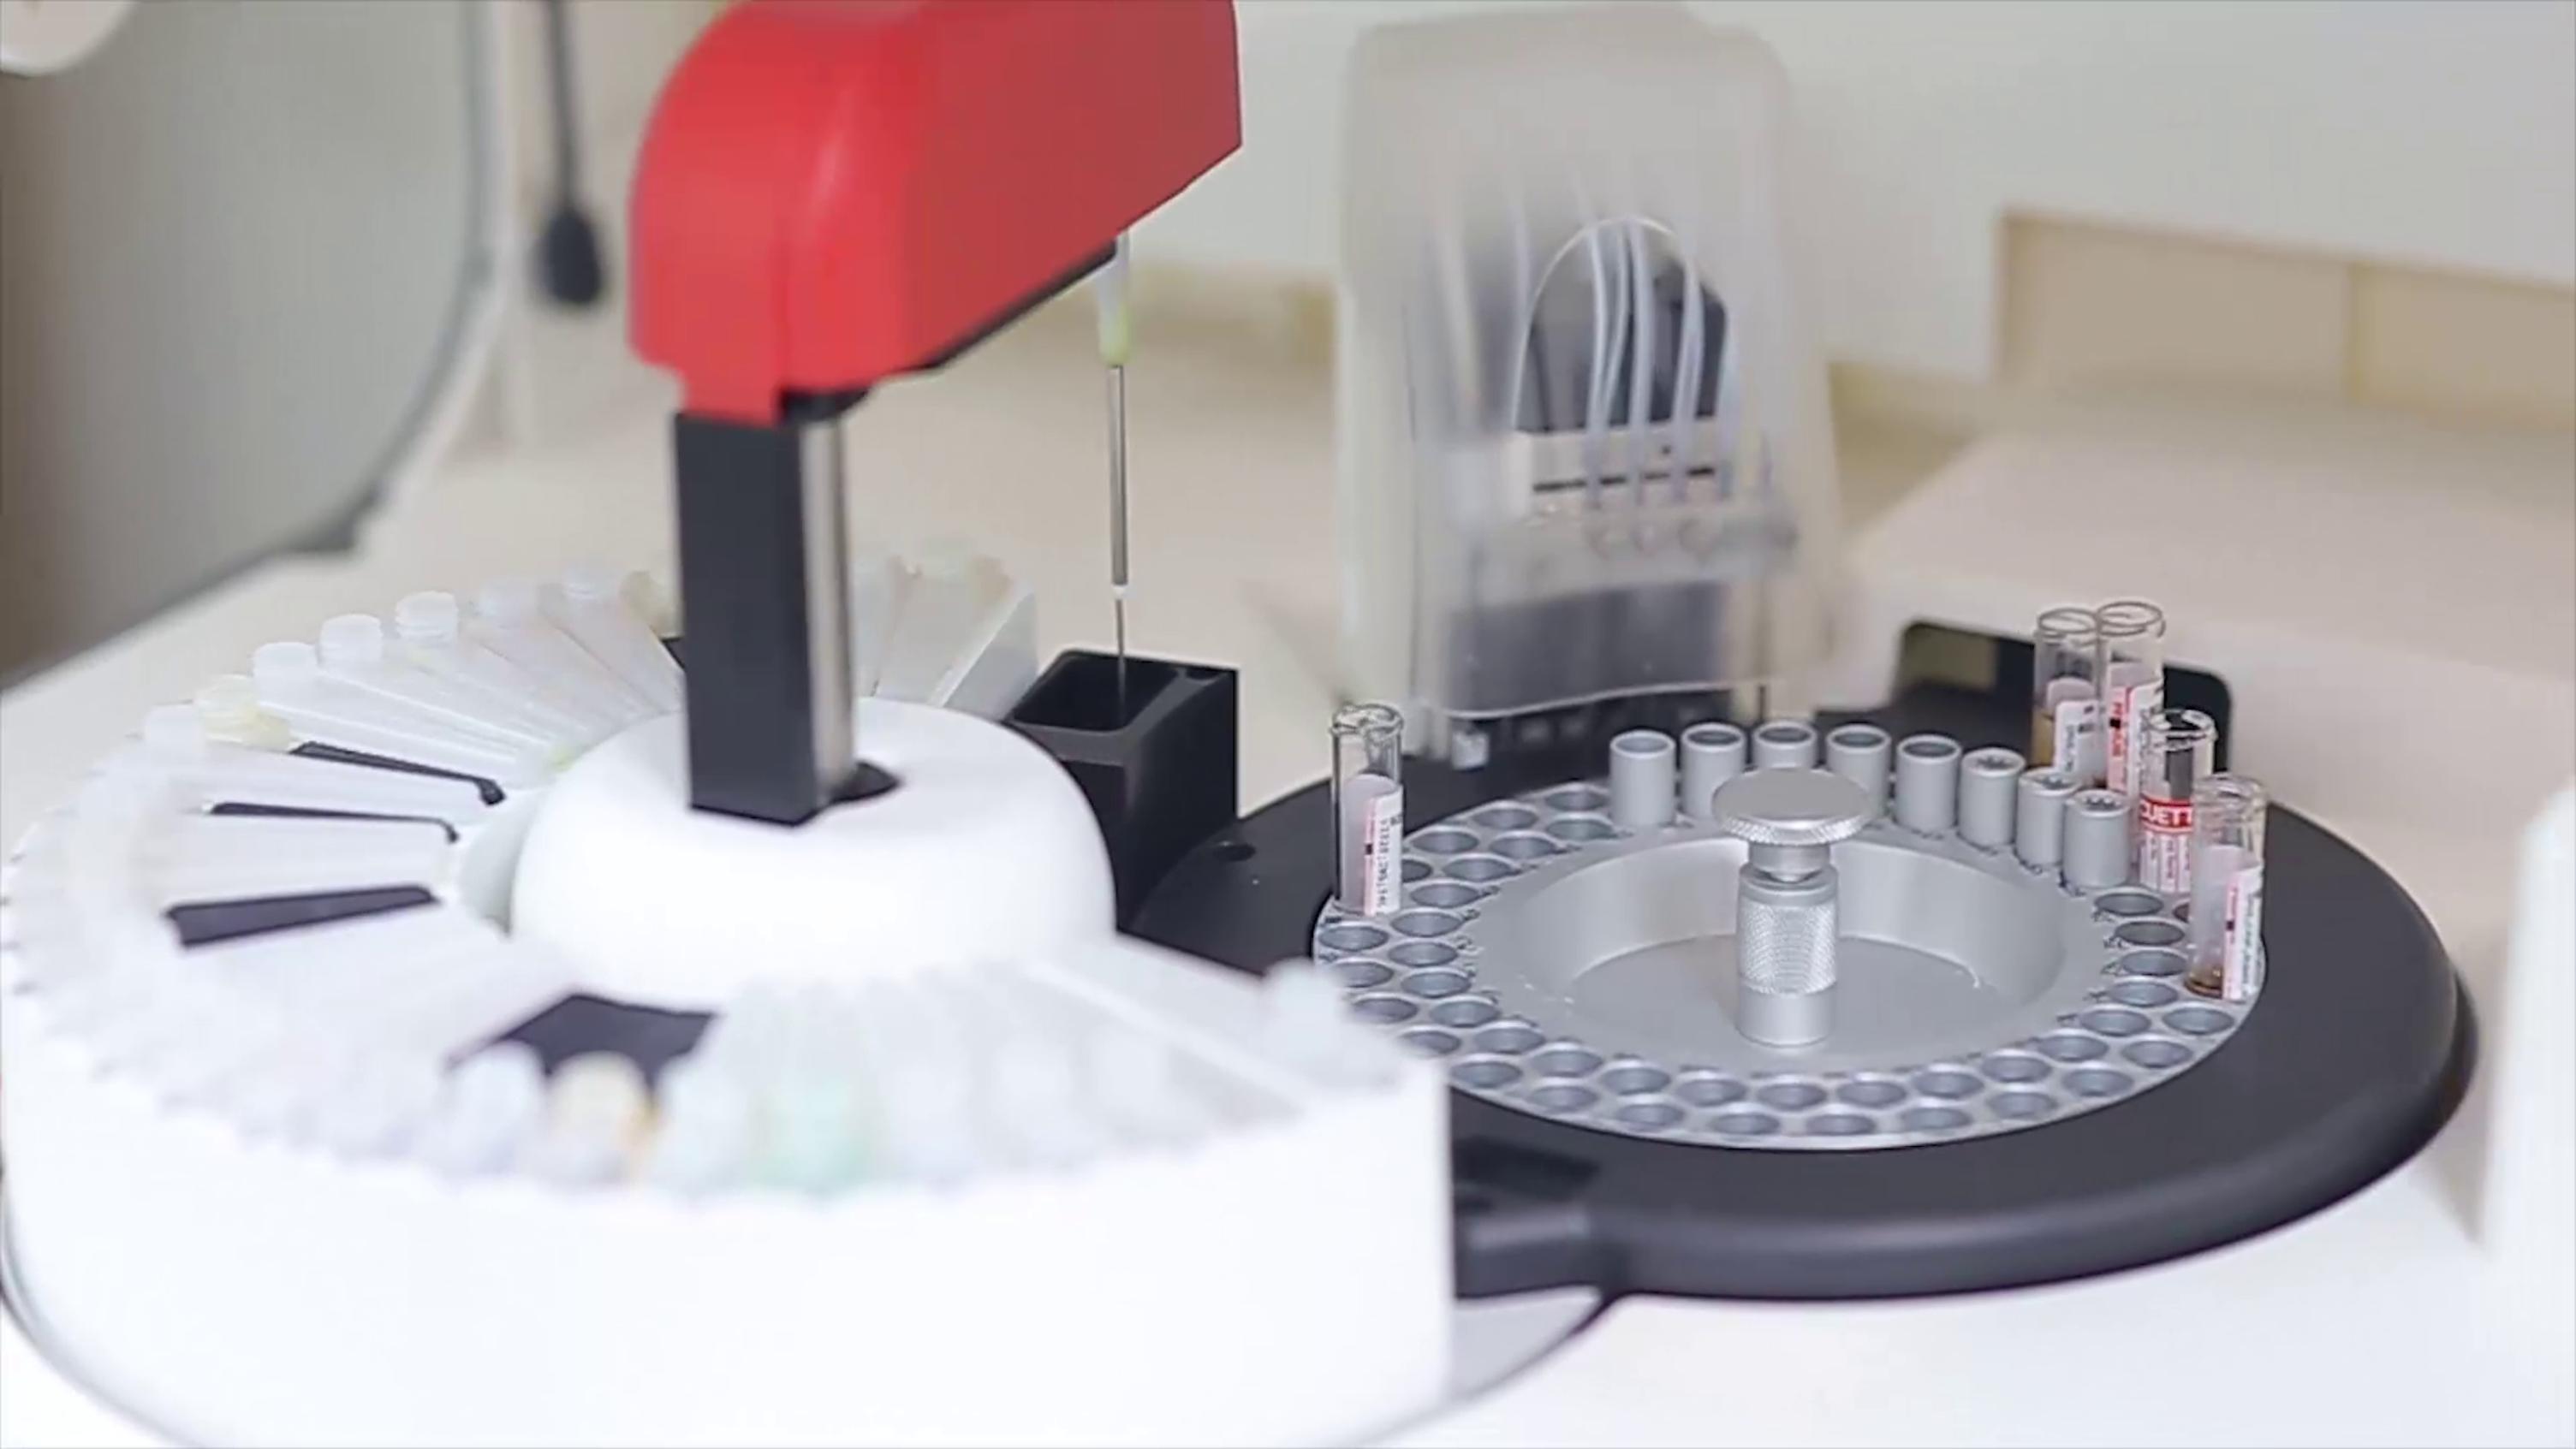 laboratorio exame centro medico equipamento